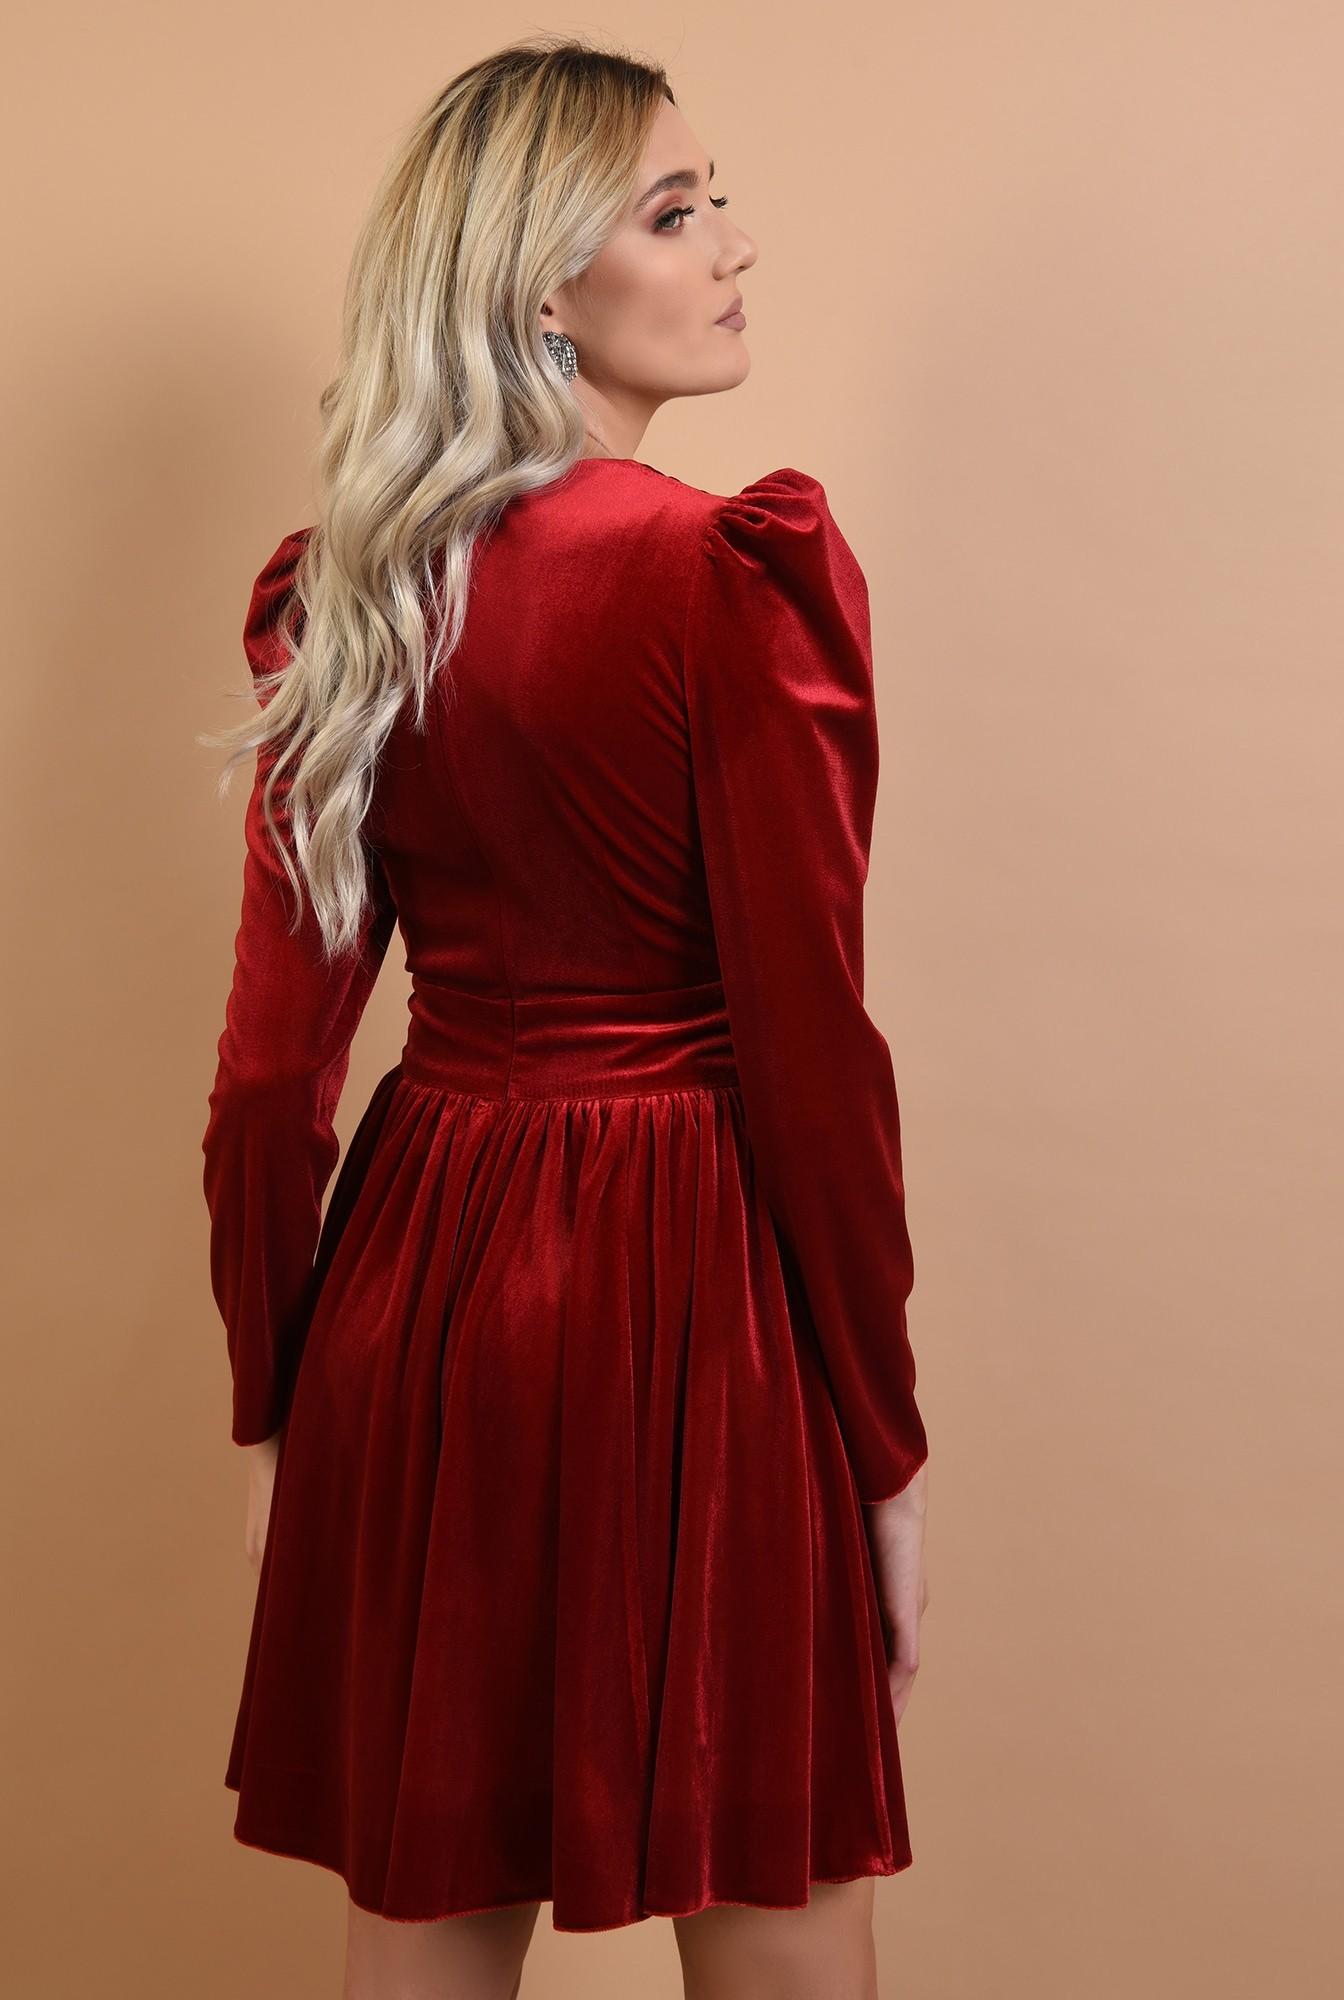 1 - rochie Poema, de seara, din catifea, rosie, clos, anchior petrecut